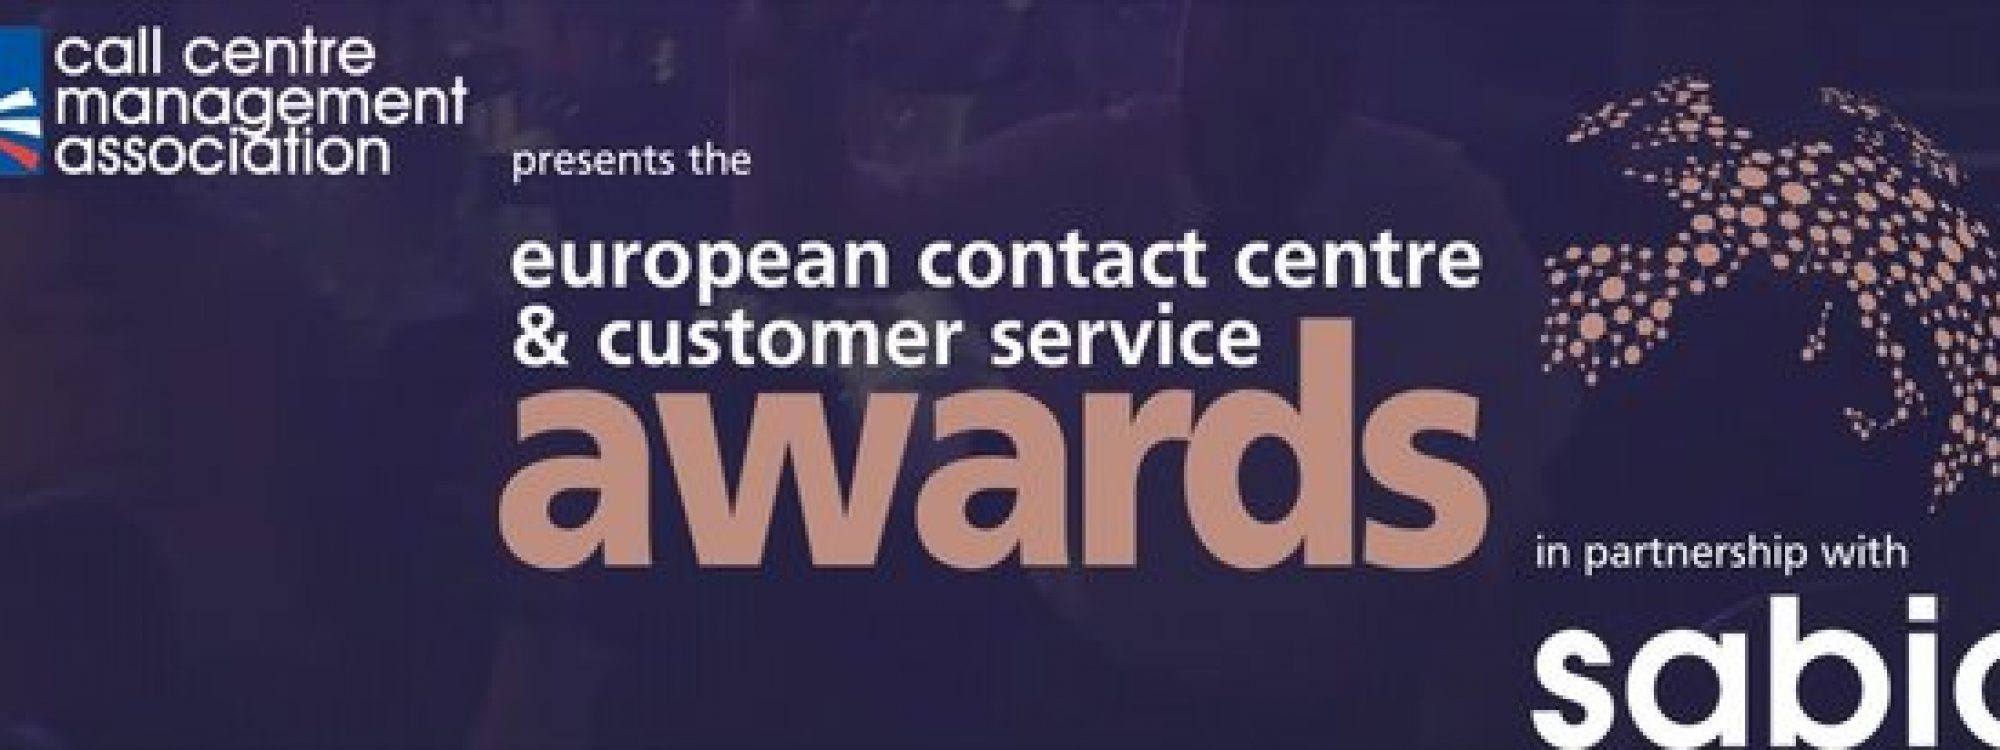 Content Guru Sponsor European Contact Centre and Customer Service Awards 2016